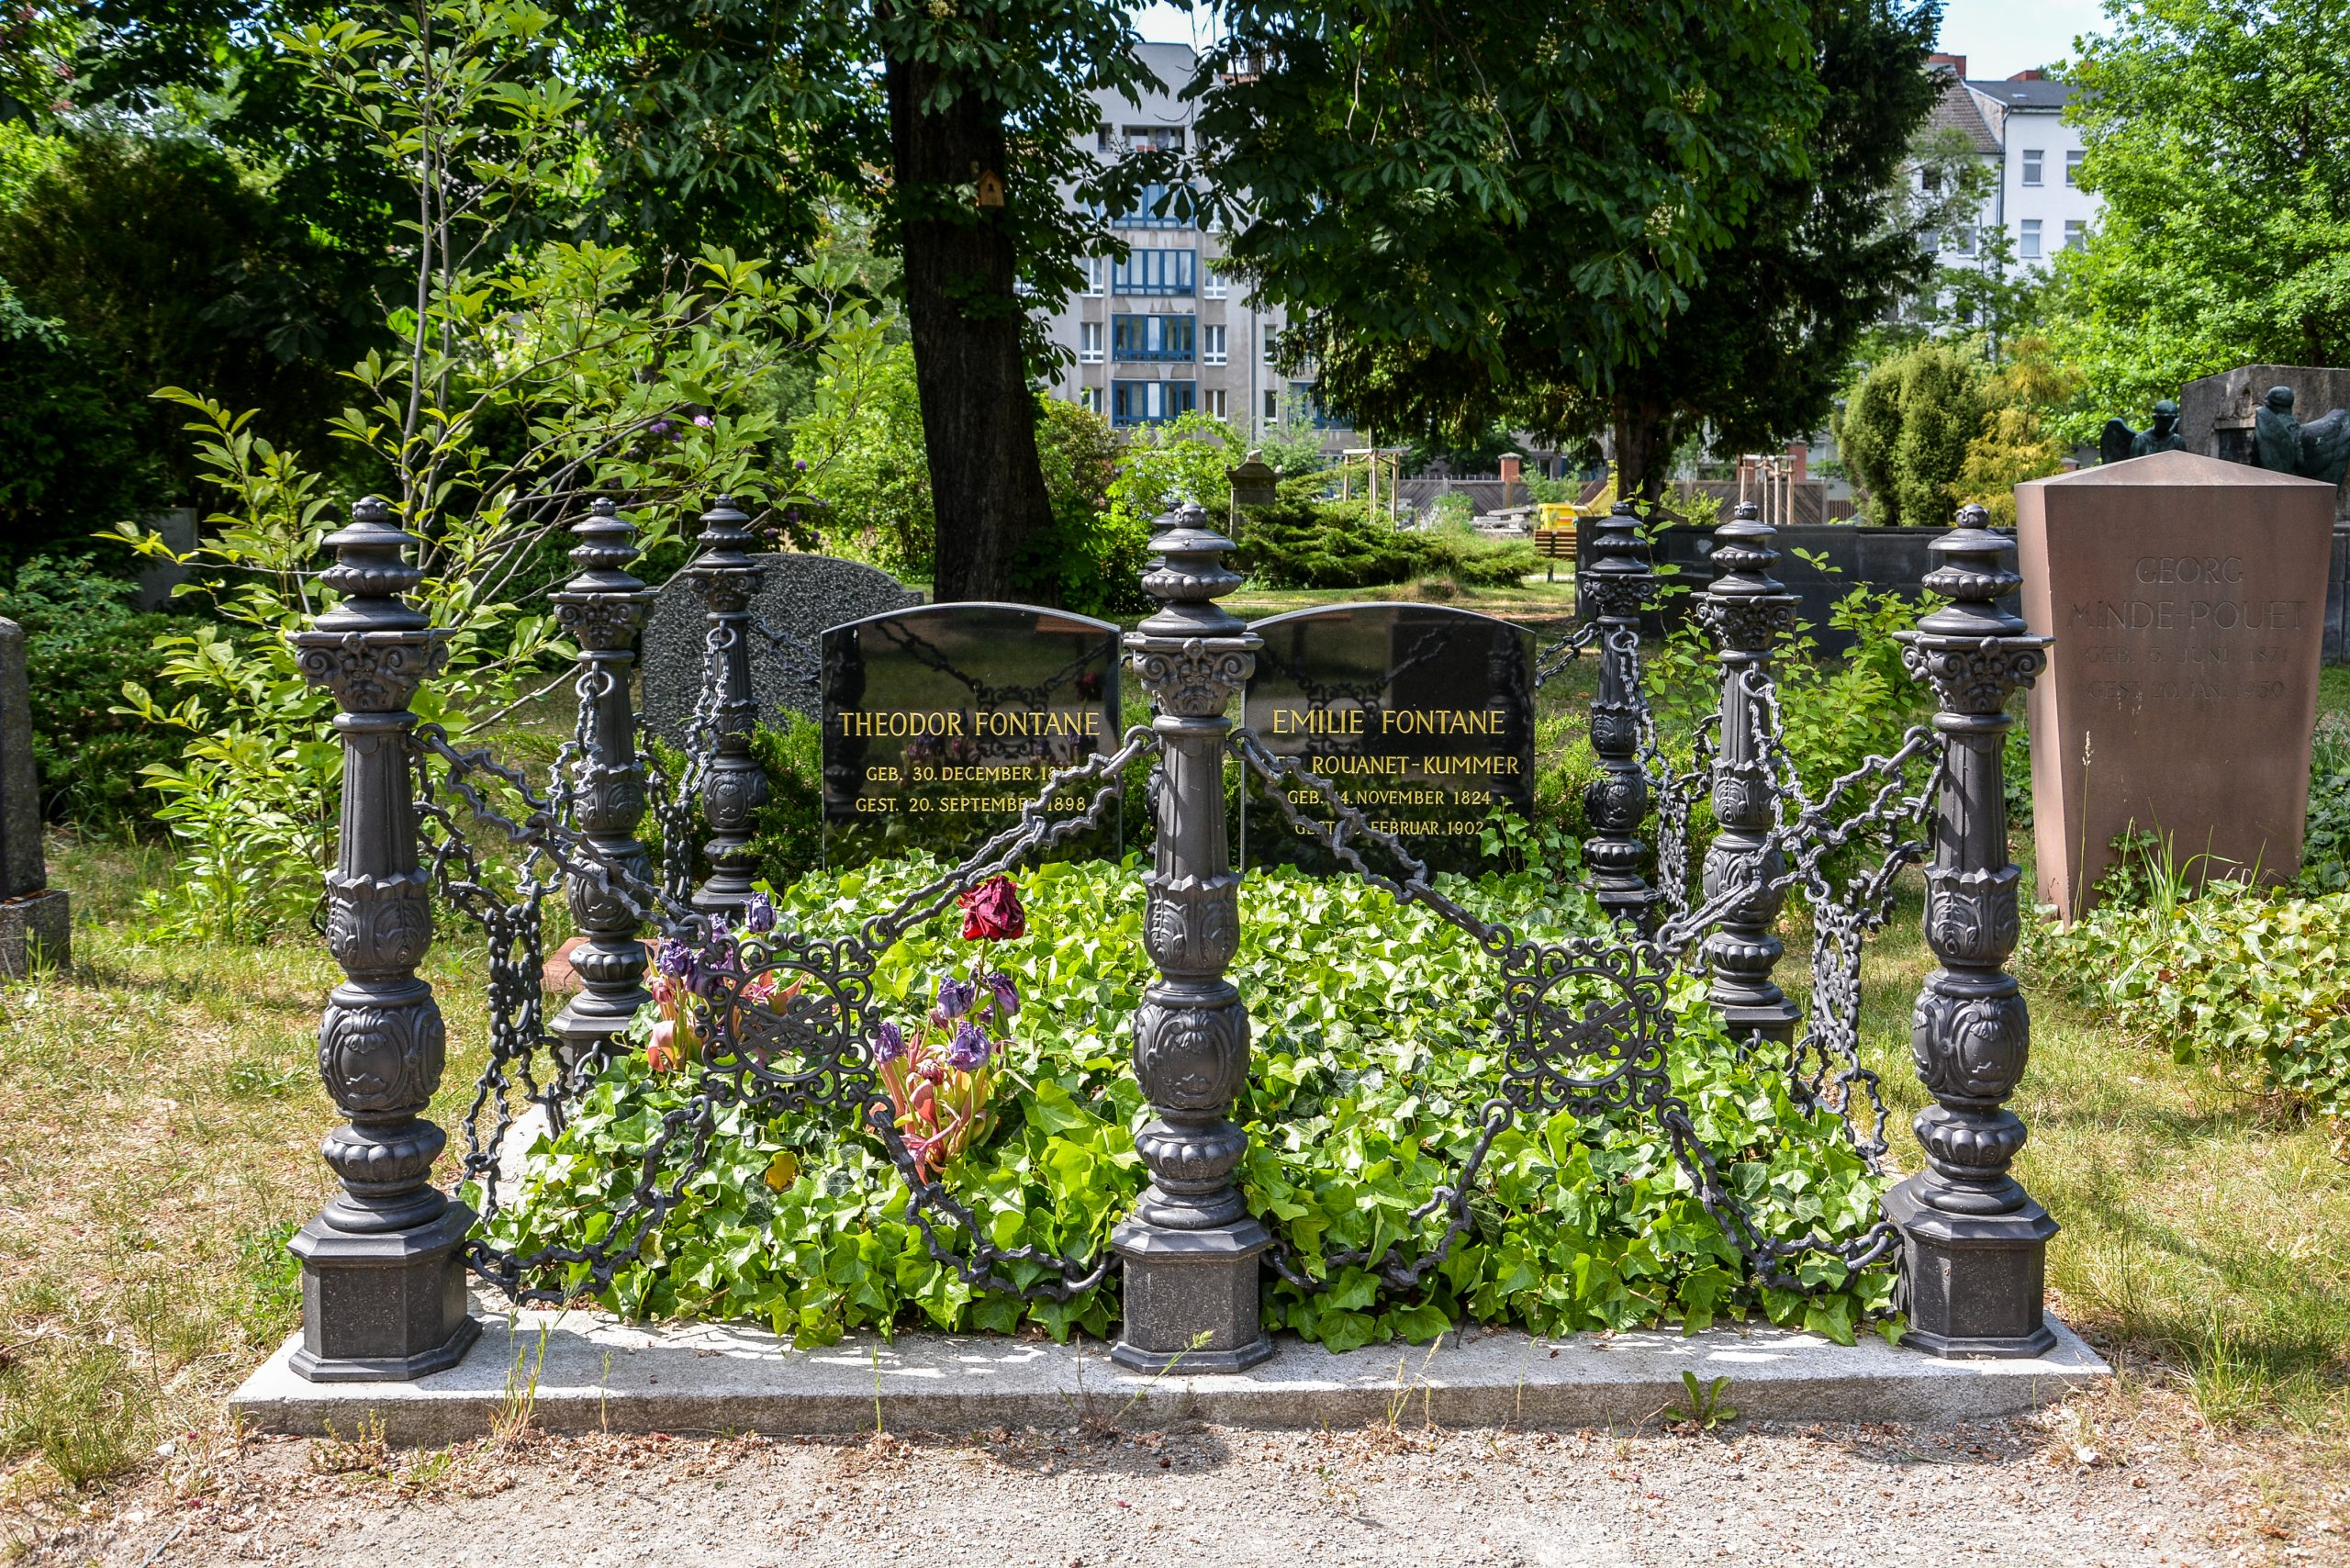 grab theodor fontane berlin berlin kuppelkreuz berliner dom berlin cathedral church cross st hedwig friedhof cemetery domfriedhof franzoesischer friedhof